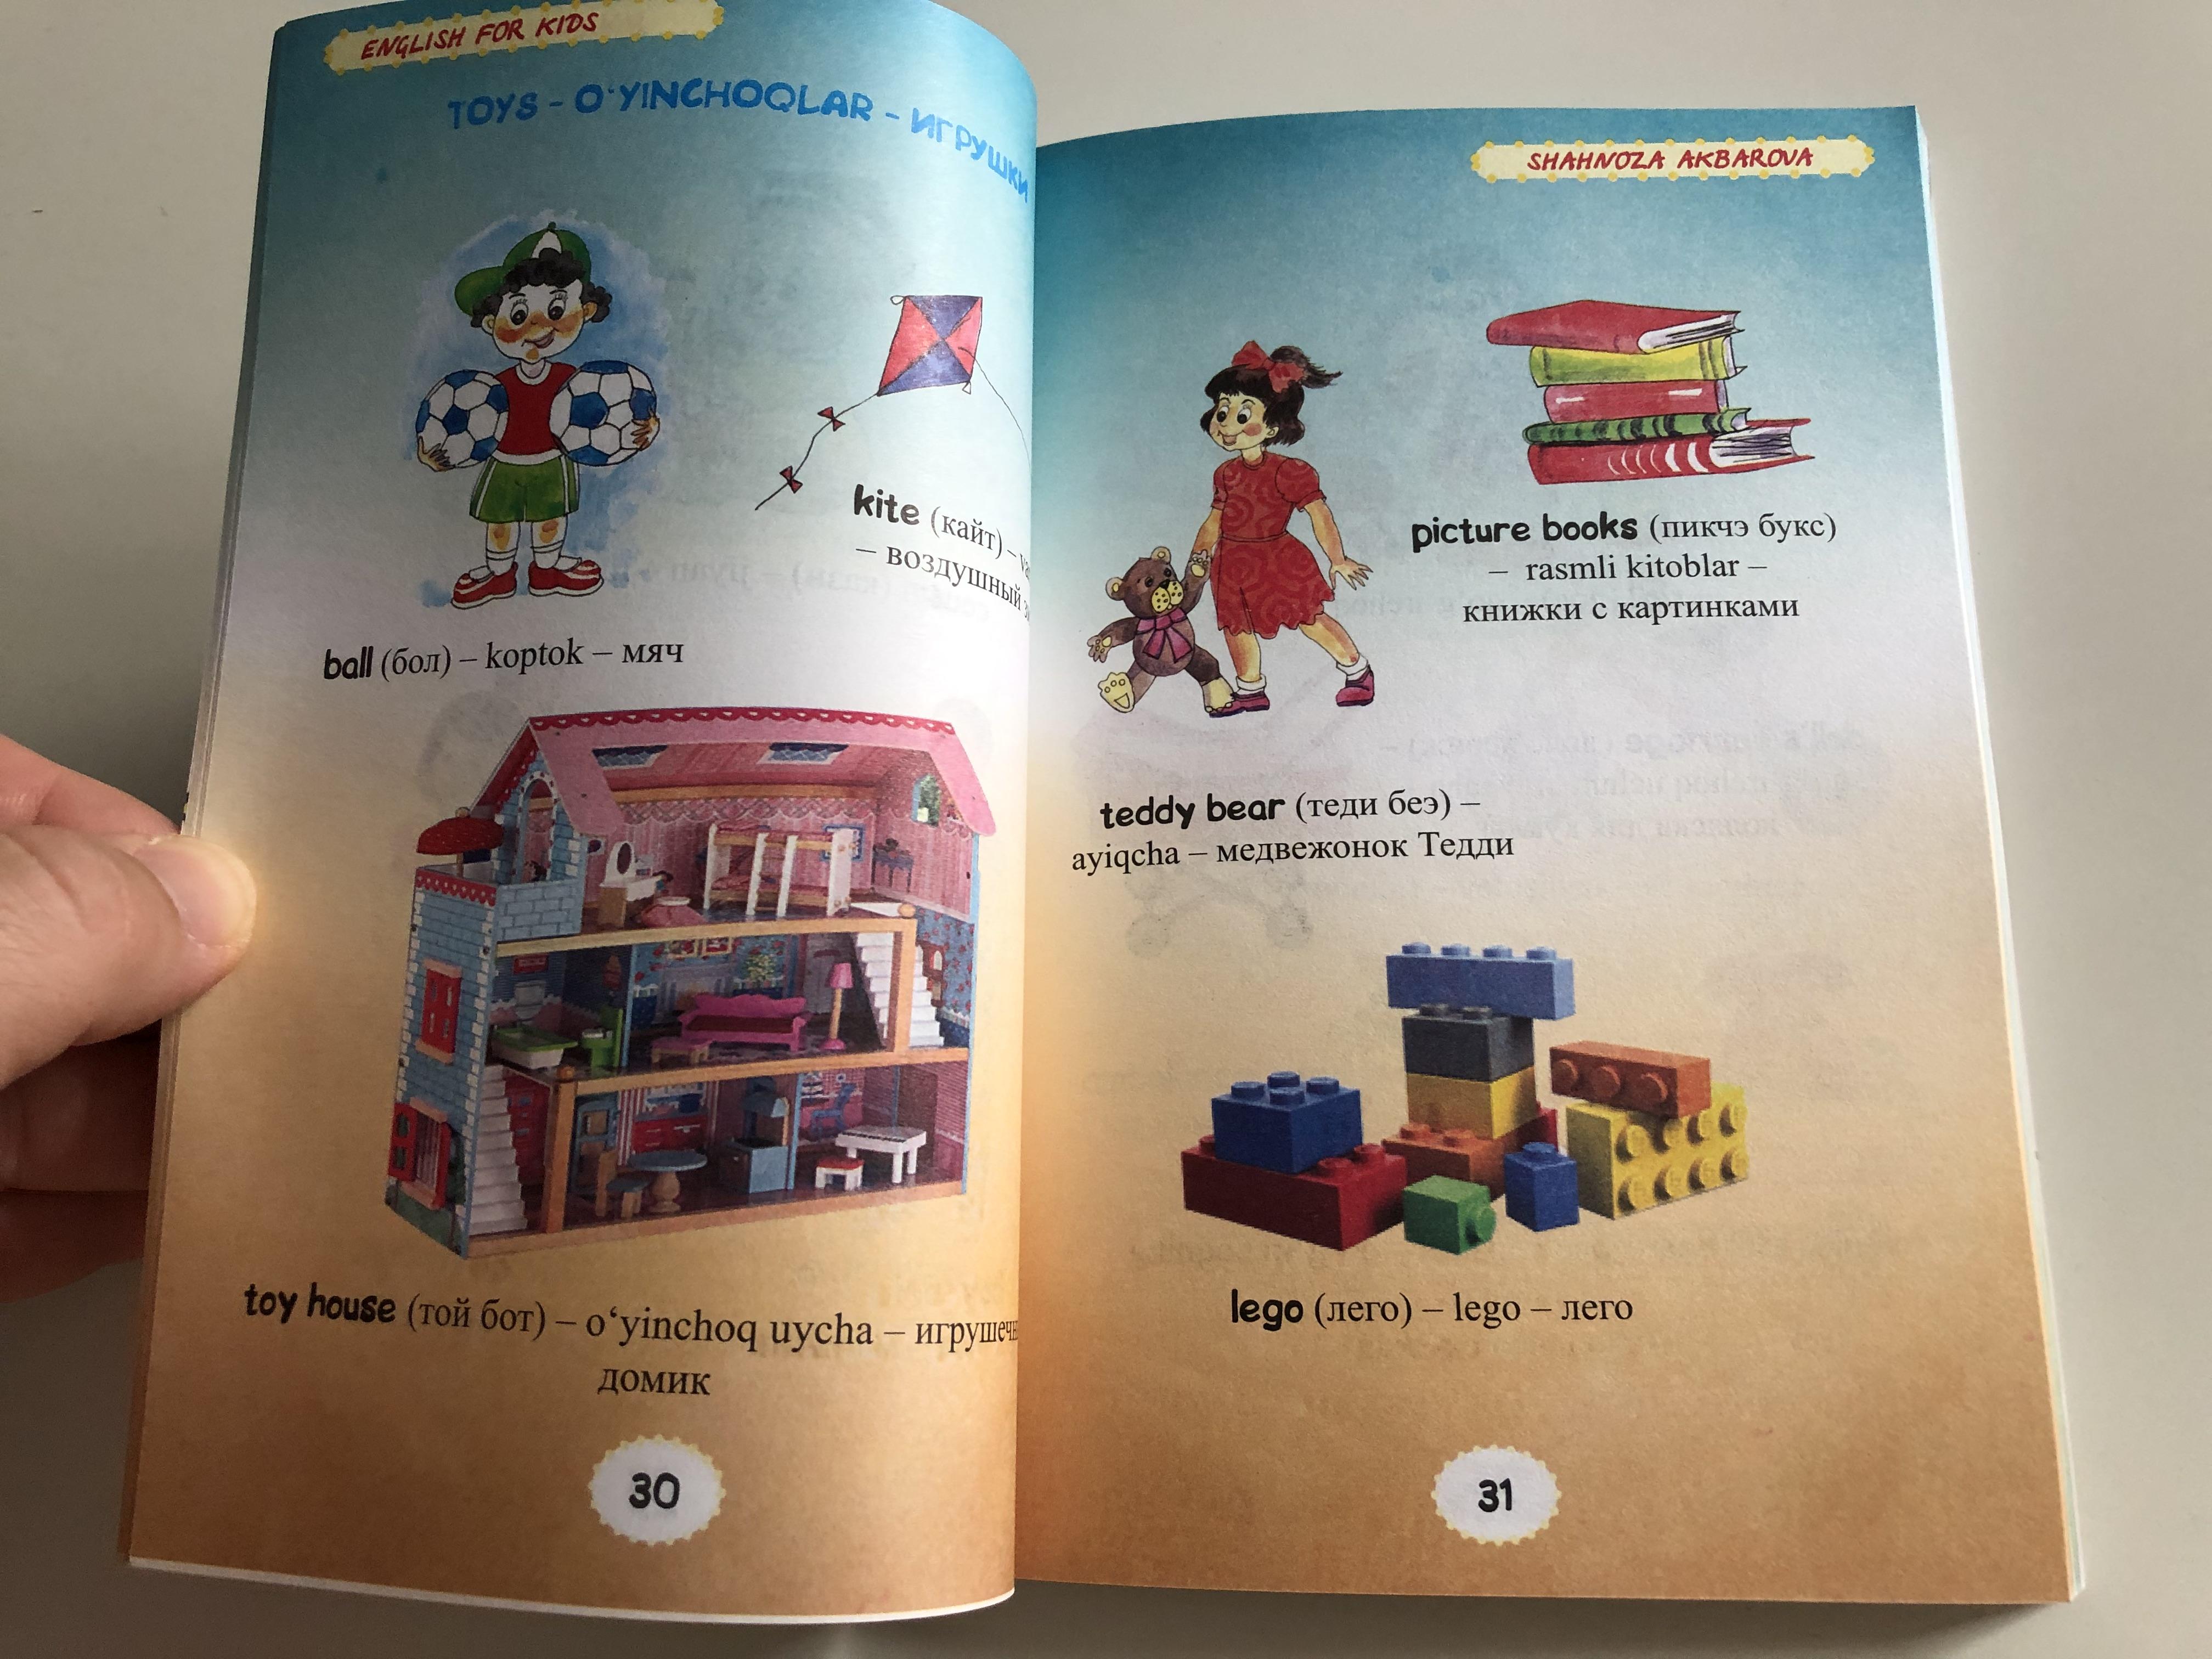 bolajonlar-uchun-ingliz-tili-by-shahnoza-akbarova-english-for-kids-allovance-for-preschoolers-parents-and-caregivers-uzbek-russian-english-learning-book-paperback-color-pages-ijod-press-2017-6-.jpg